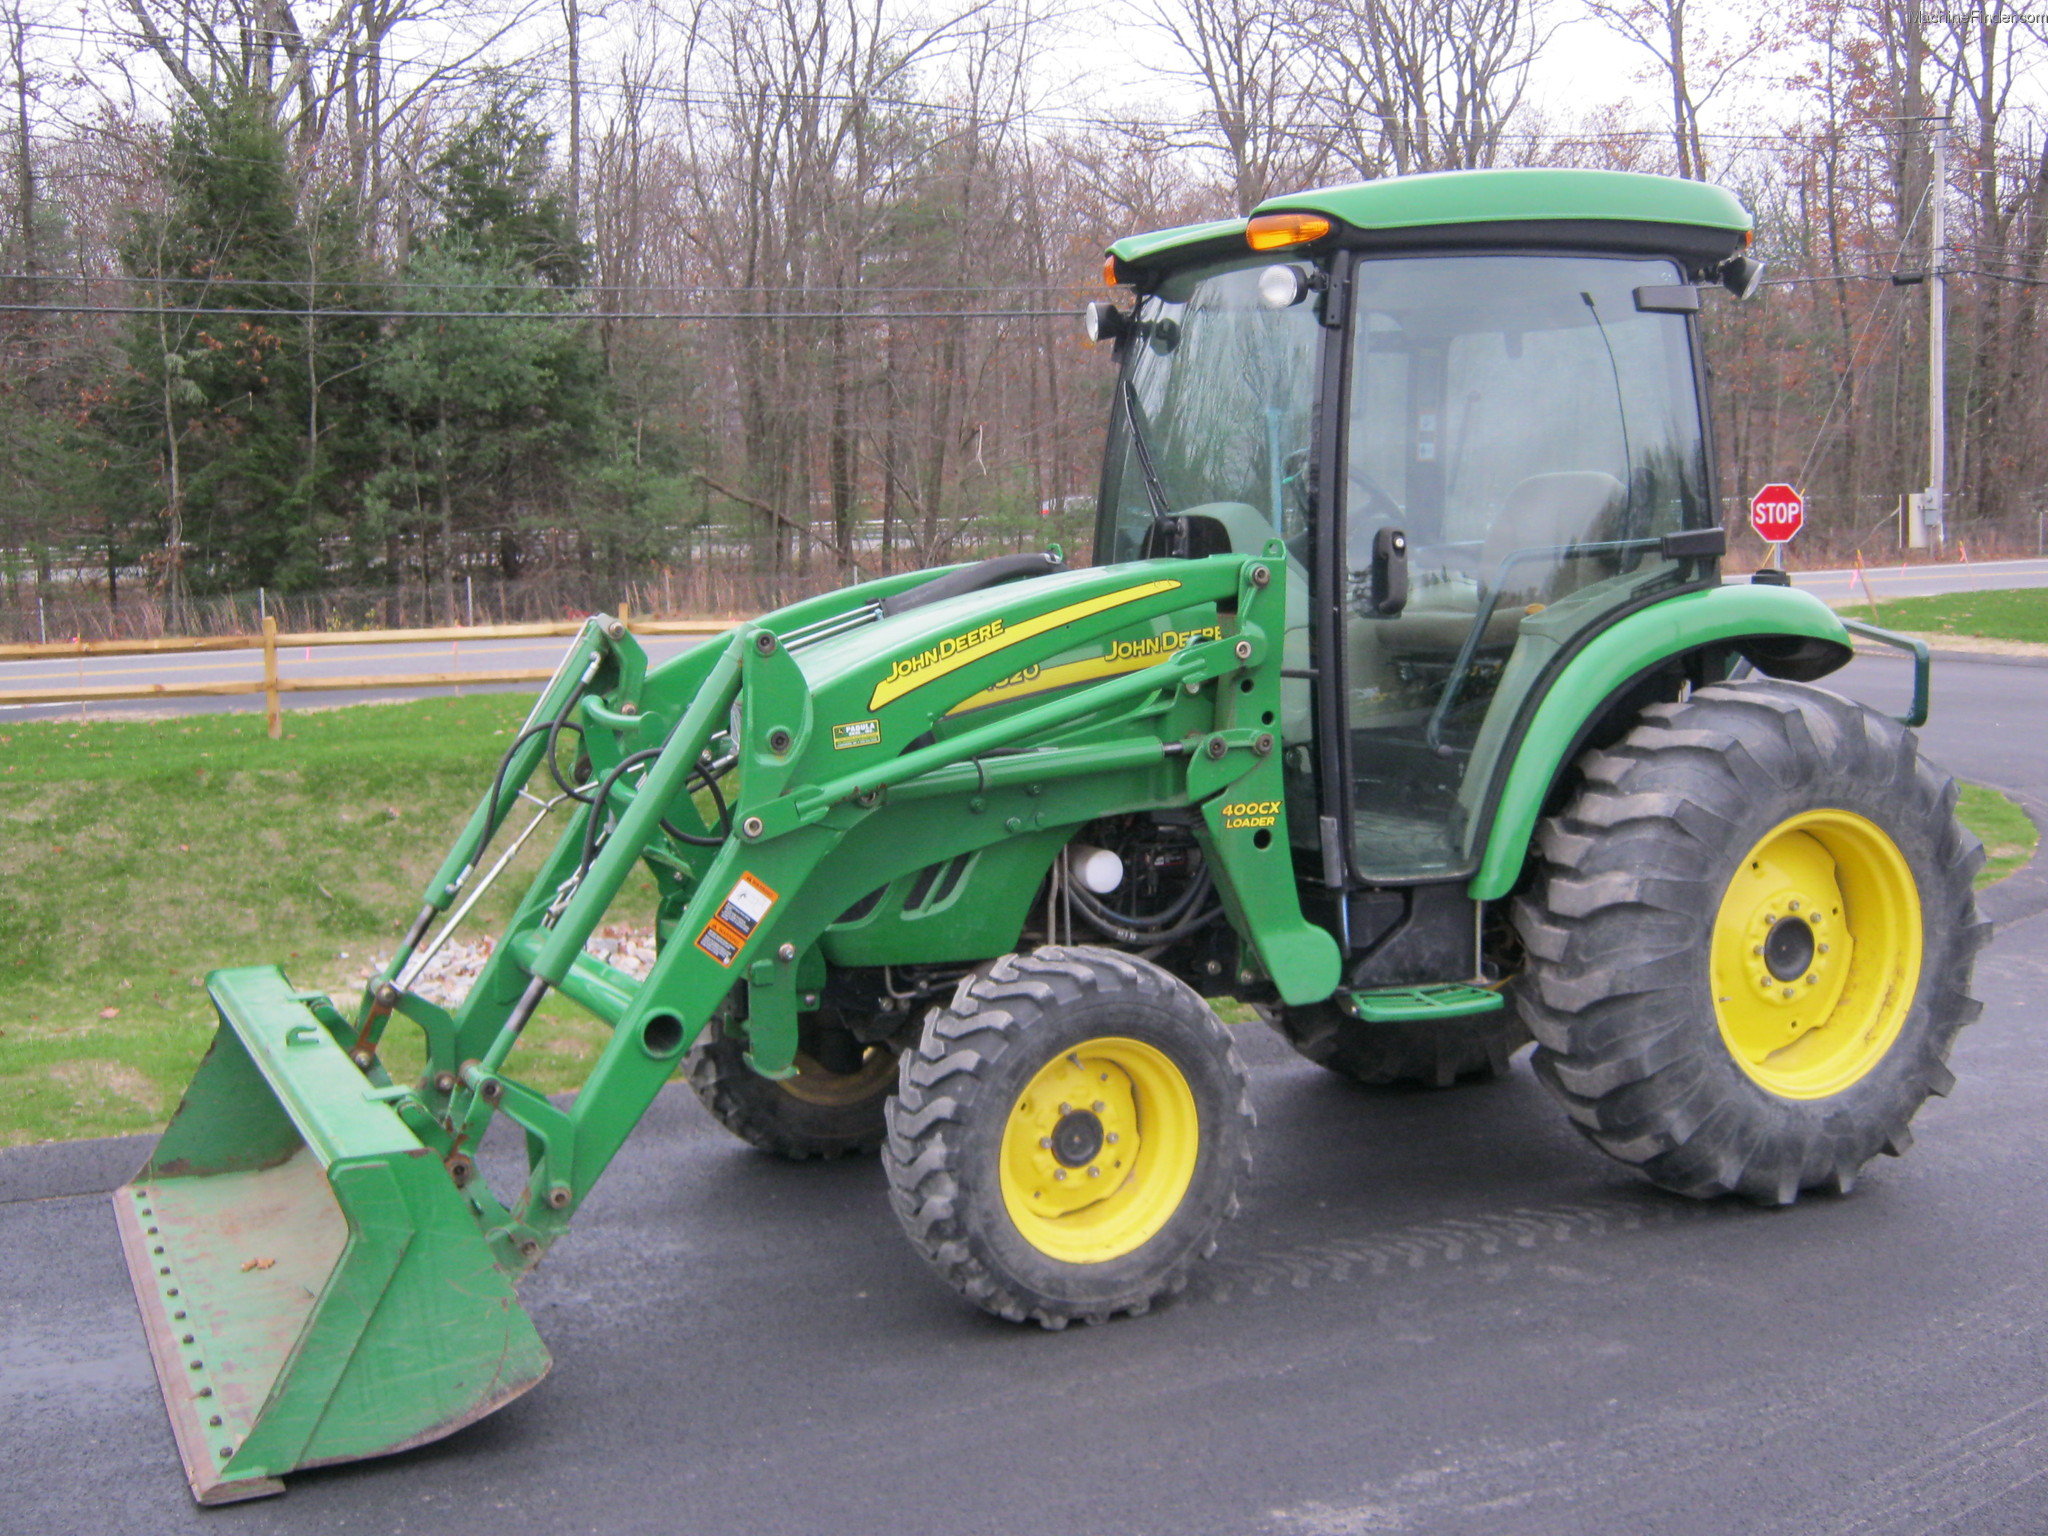 2009 John Deere 4320 Tractors - Compact (1-40hp.) - John ...